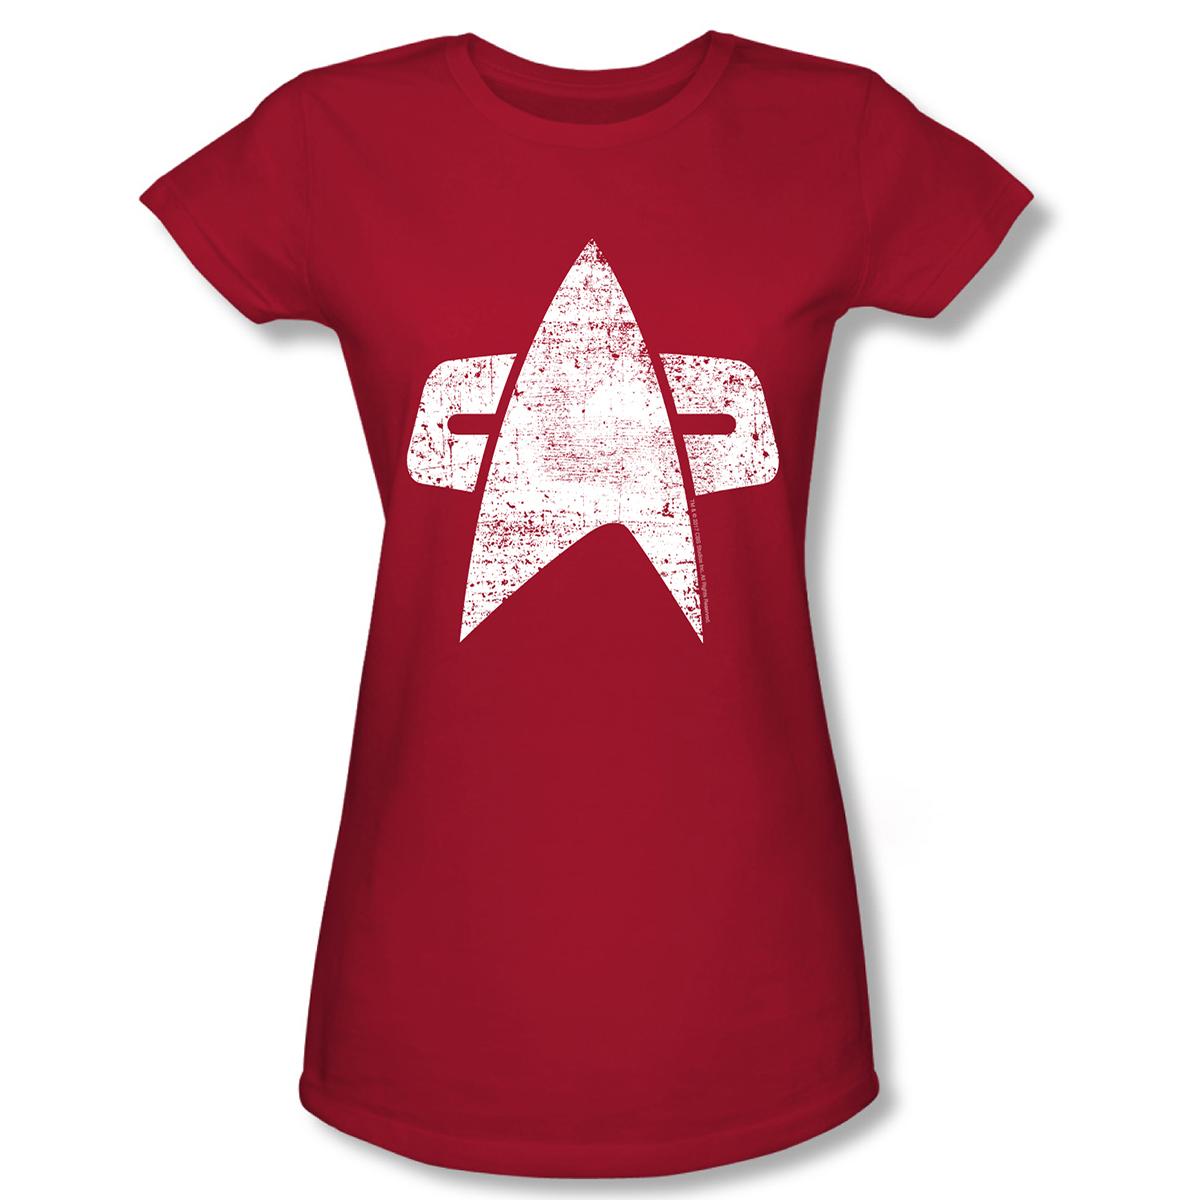 Star Trek Voyager Distressed Delta Women's Slim Fit T-Shirt